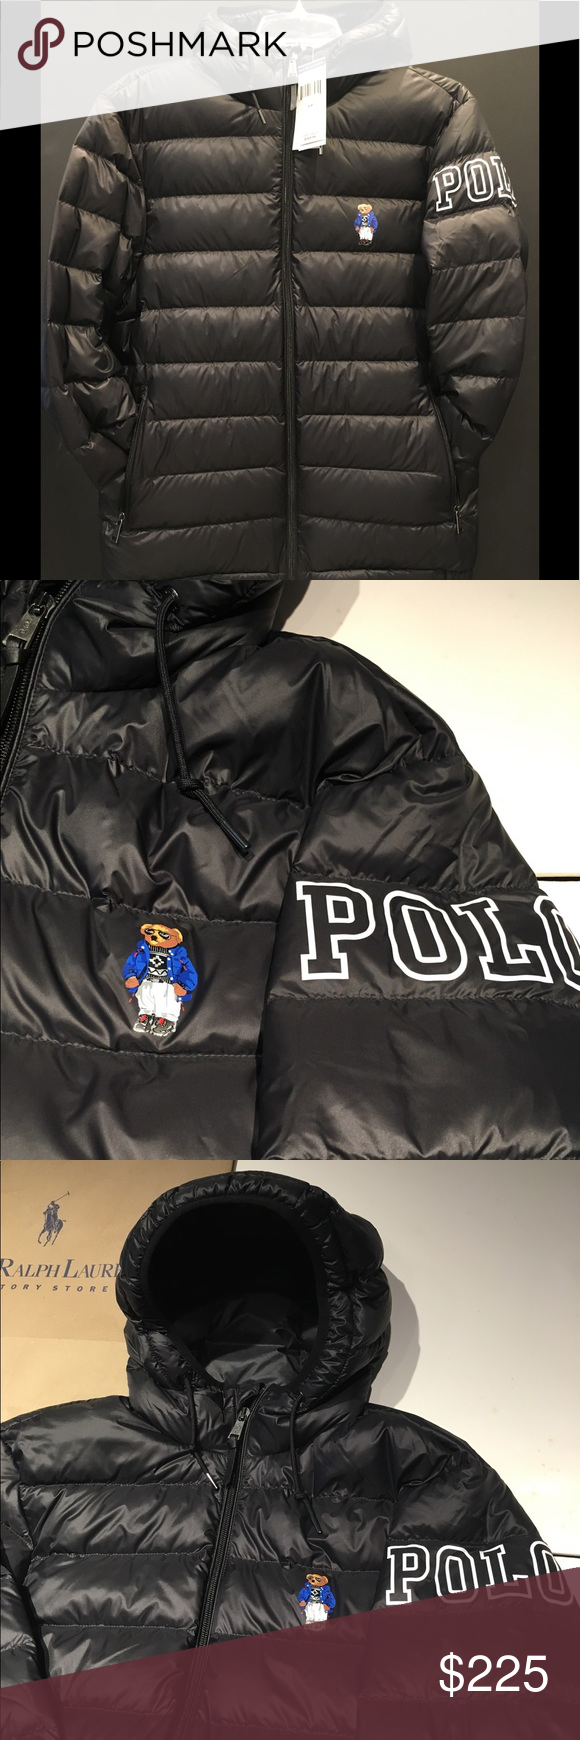 Limited Edition Polo Bear Ski Bear Down Jacket Bear Jacket Down Jacket Jackets